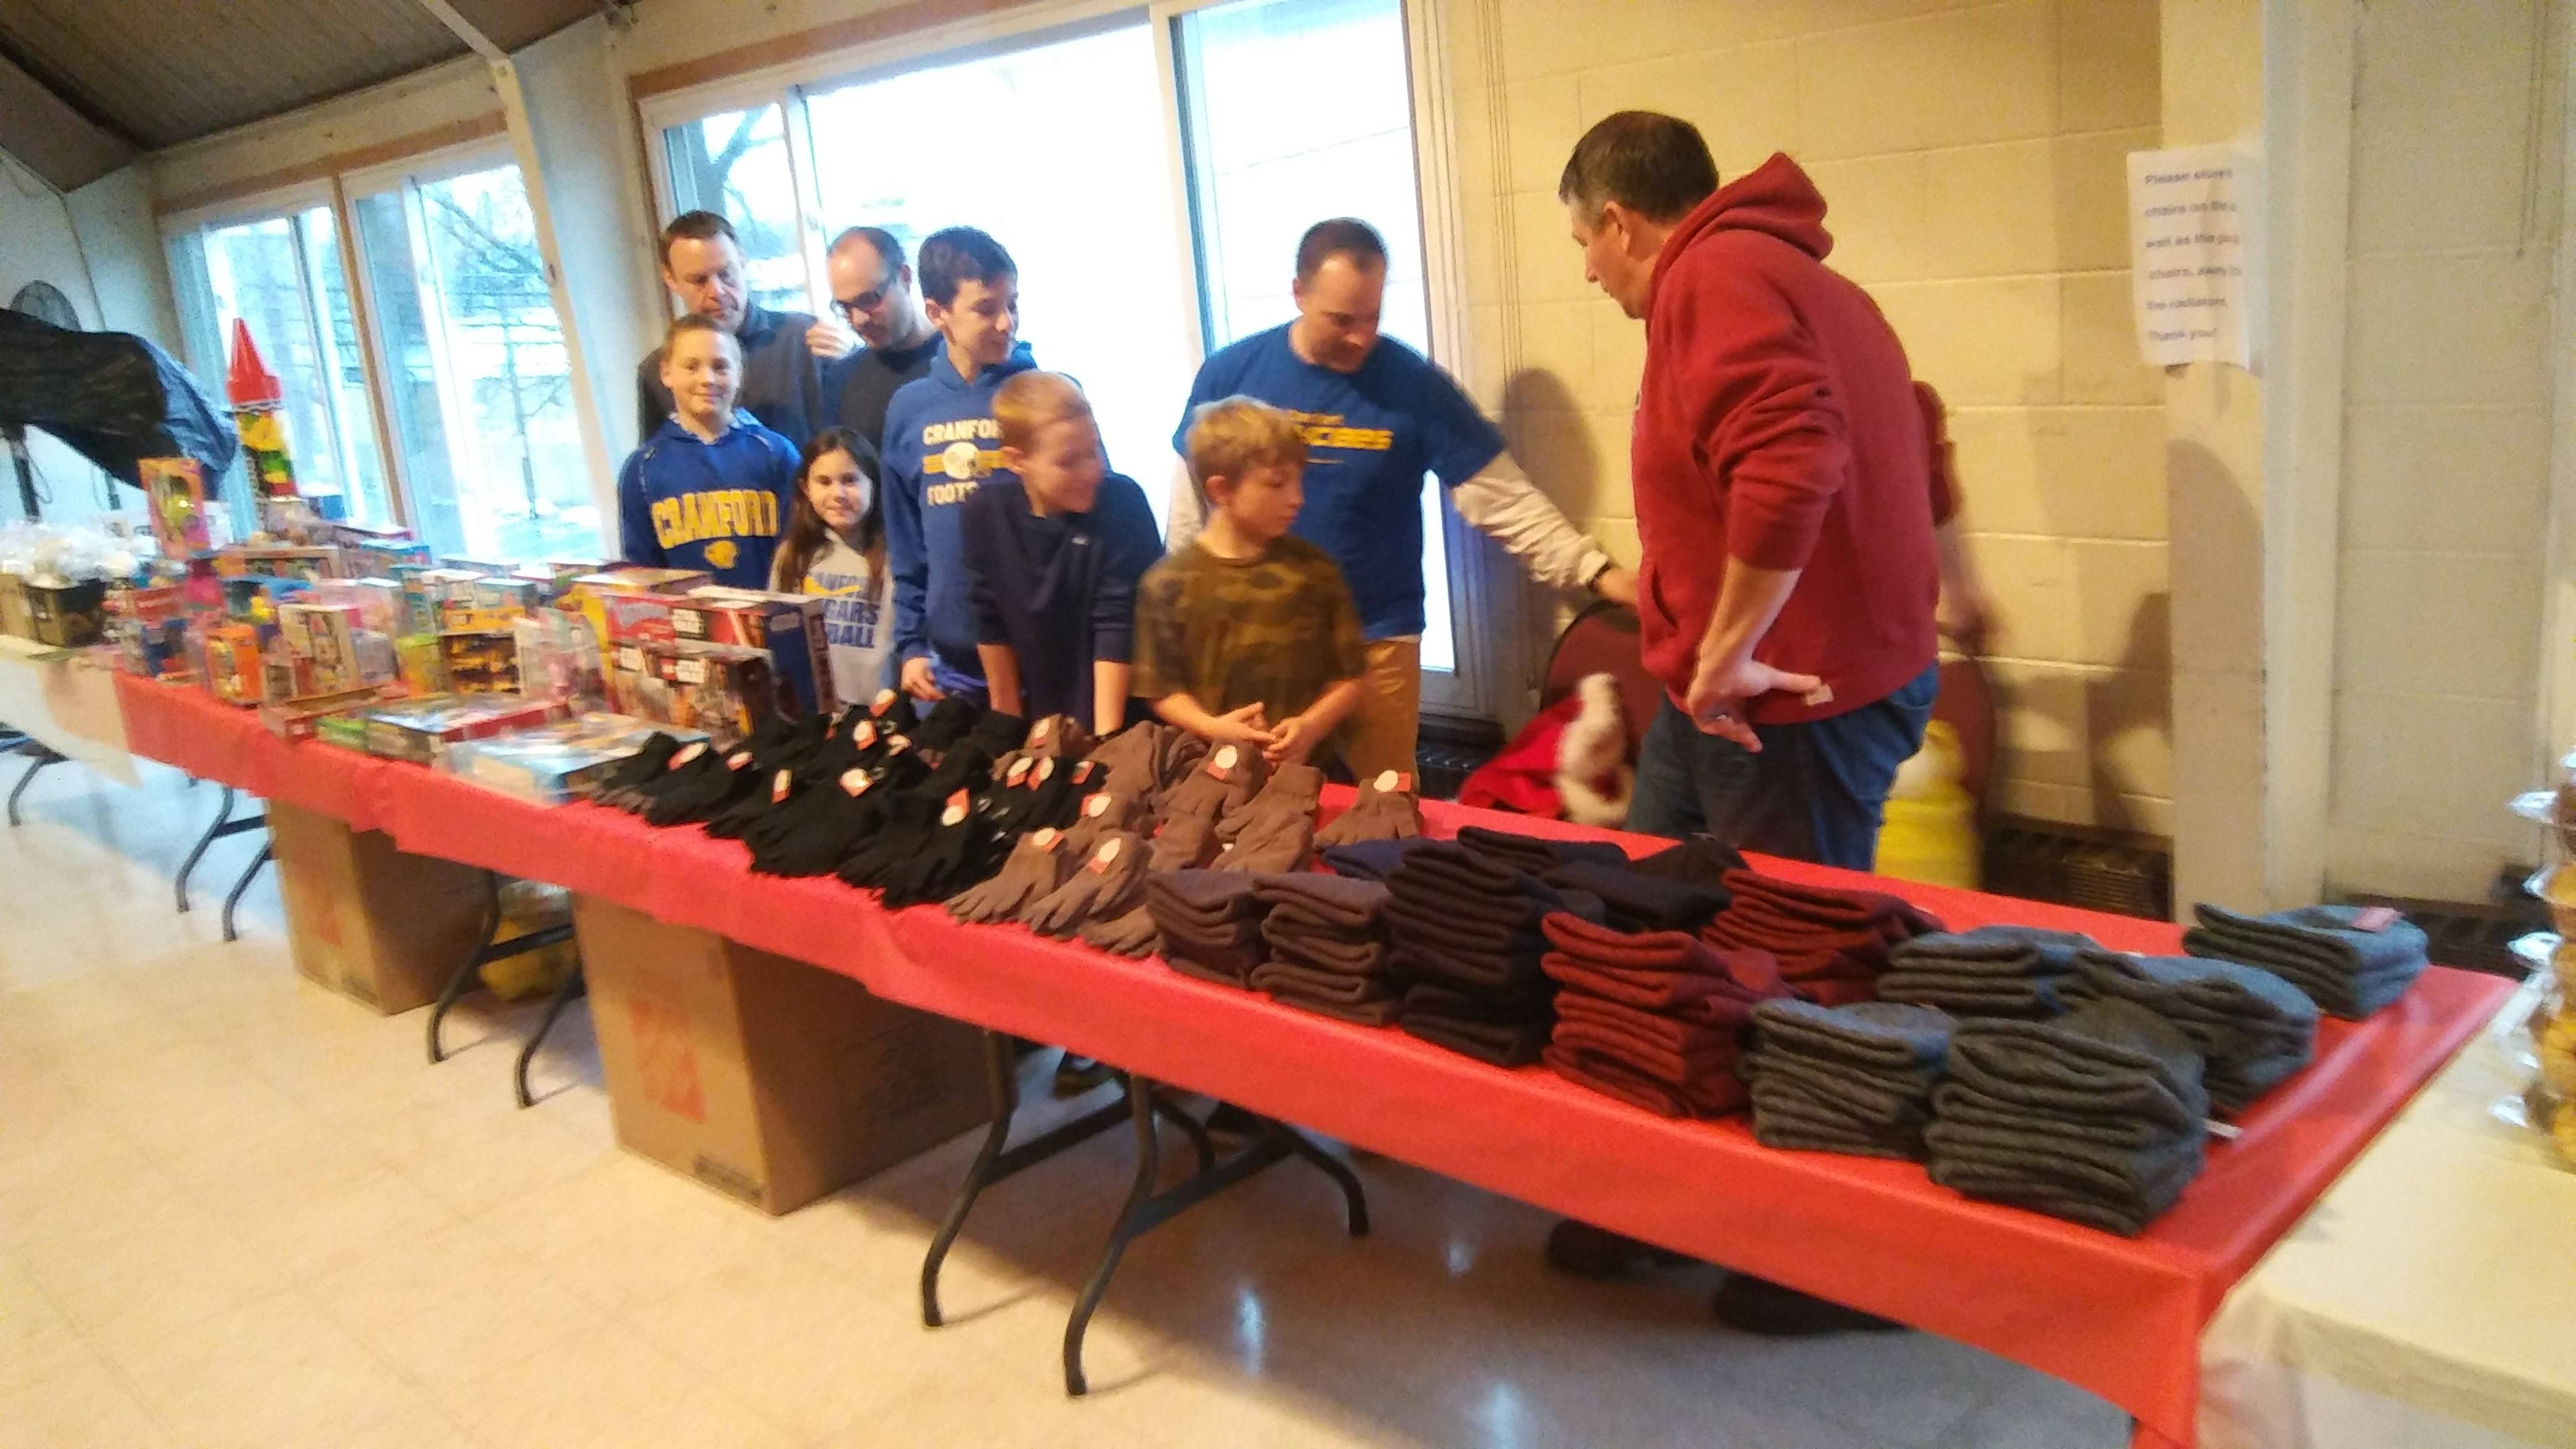 acc61da2a4516c025671_The_Cranford_Jaycees_organizing_the_donated_goods.jpg